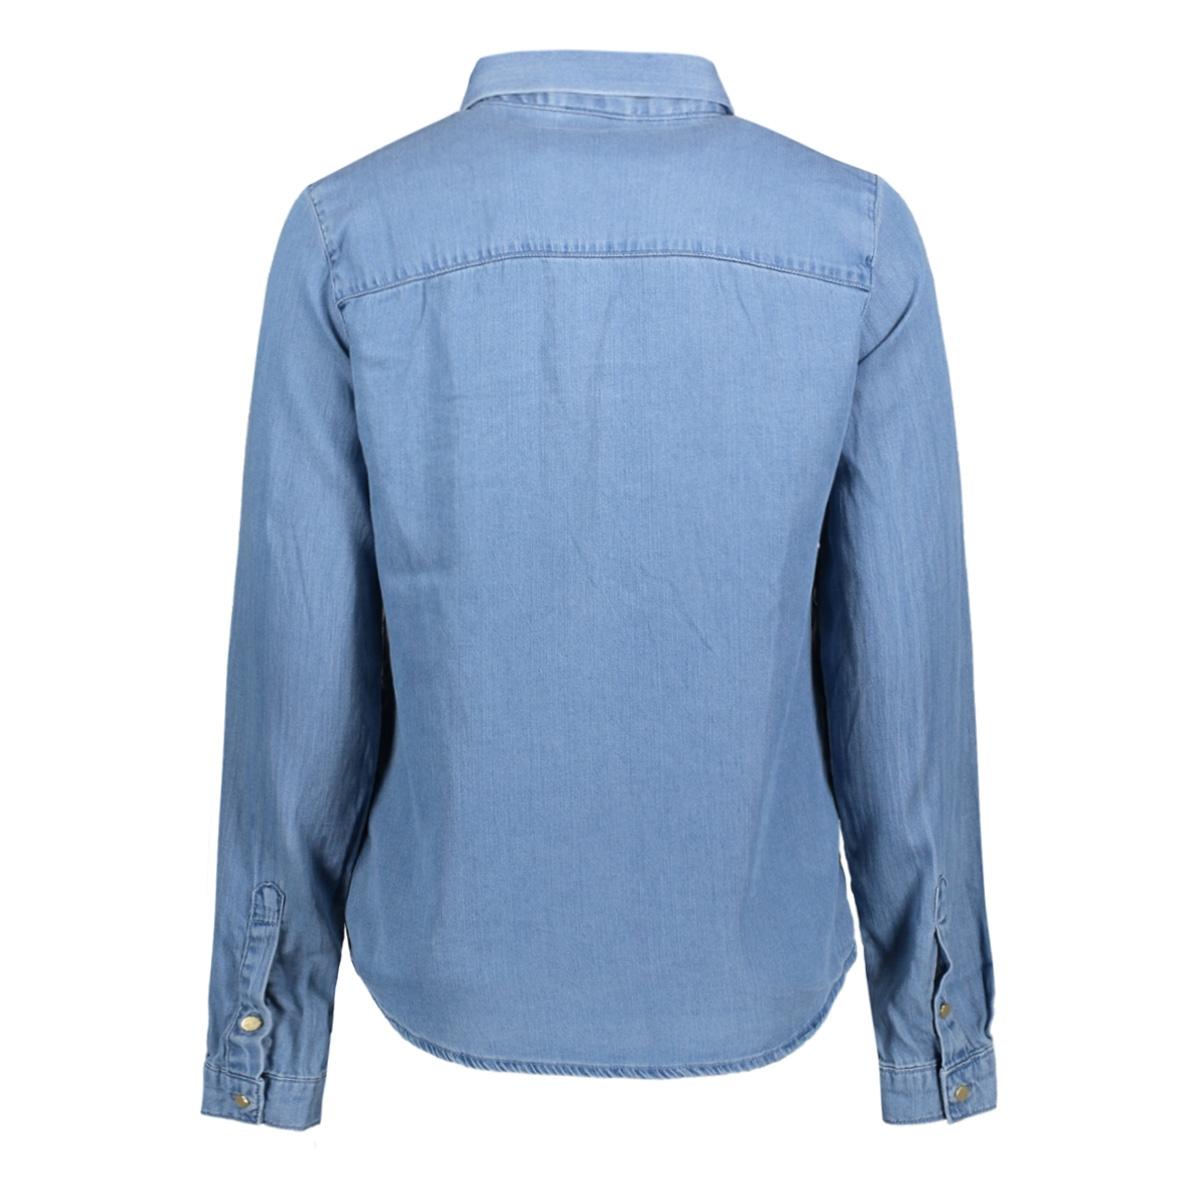 vibista bow denim shirt 14041947 vila blouse light blue denim